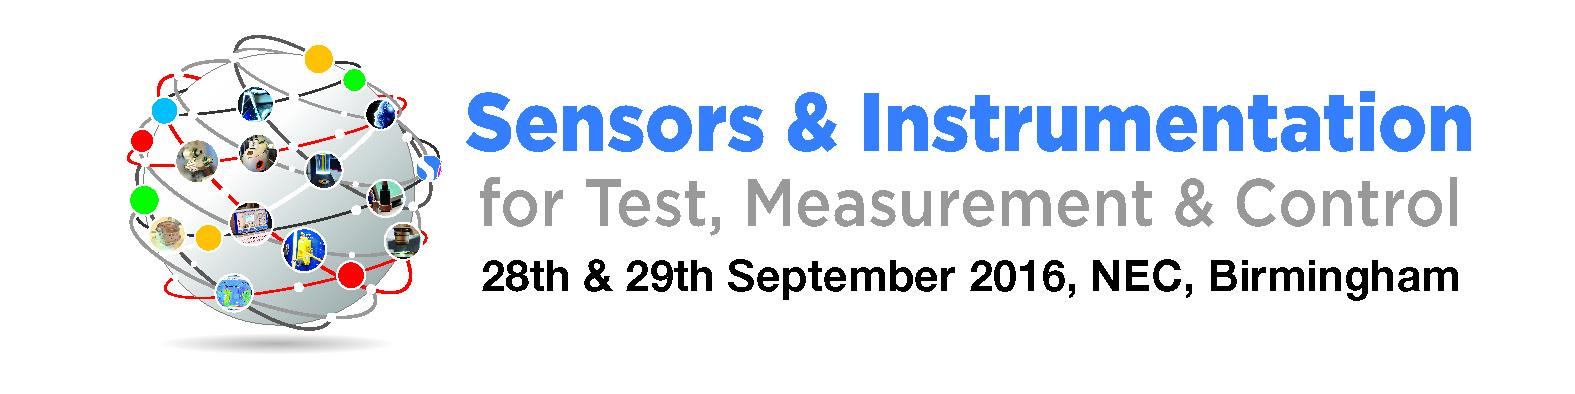 Sensors & Instrumentation 2016